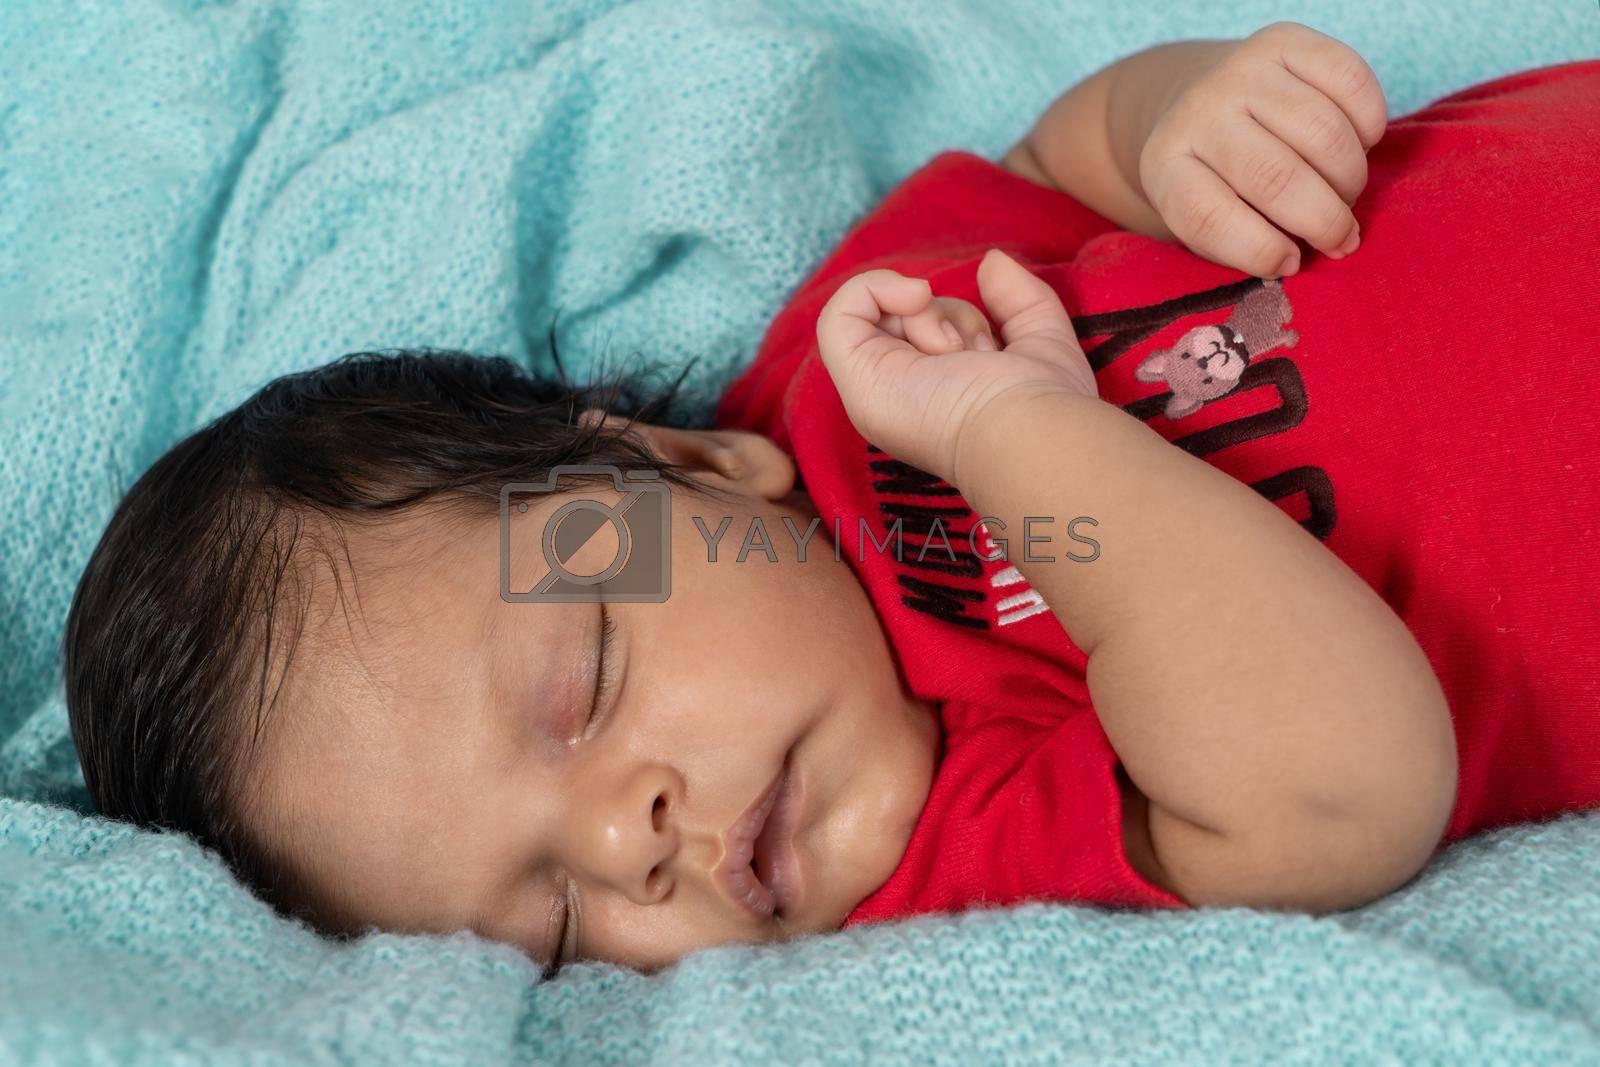 Royalty free image of Sleeping baby by jrivalta